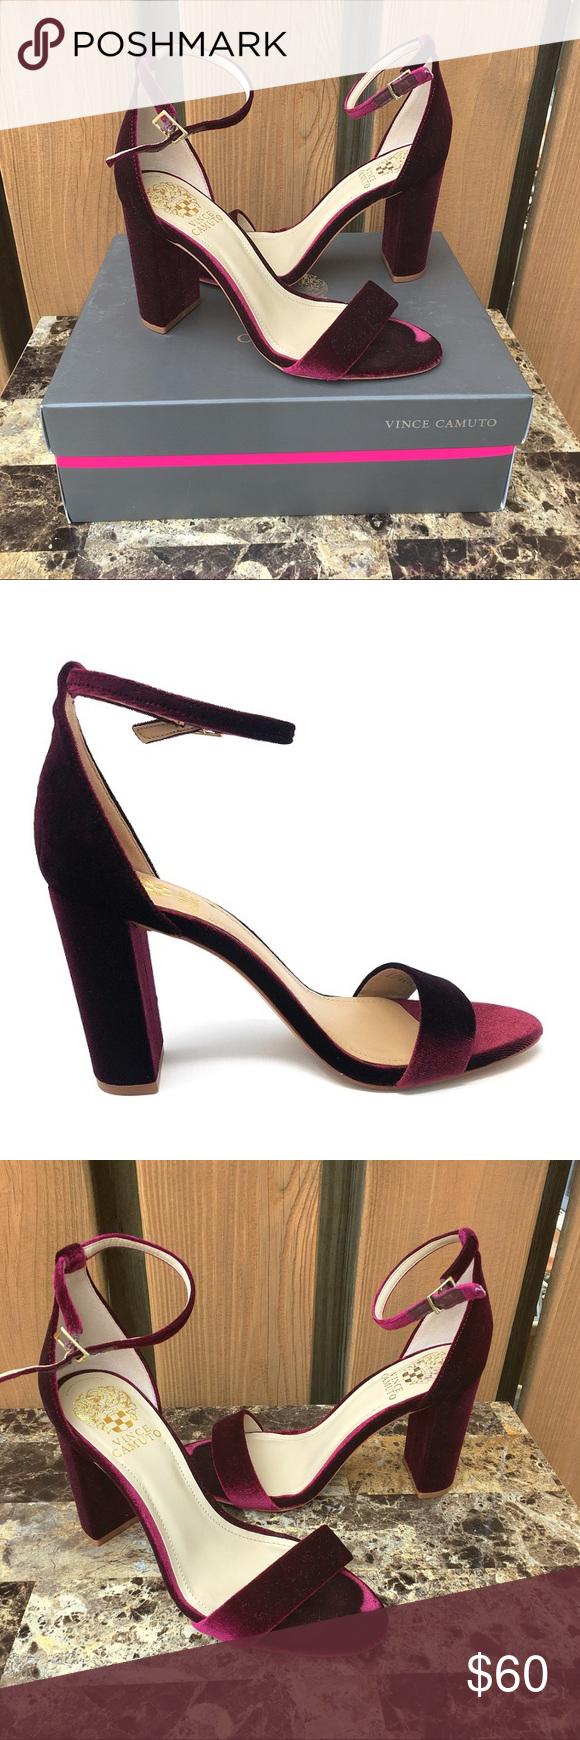 761b74b104ce Vince Camuto Berry Velvet Block Heels Vince Camuto block style heels in a  berry wine